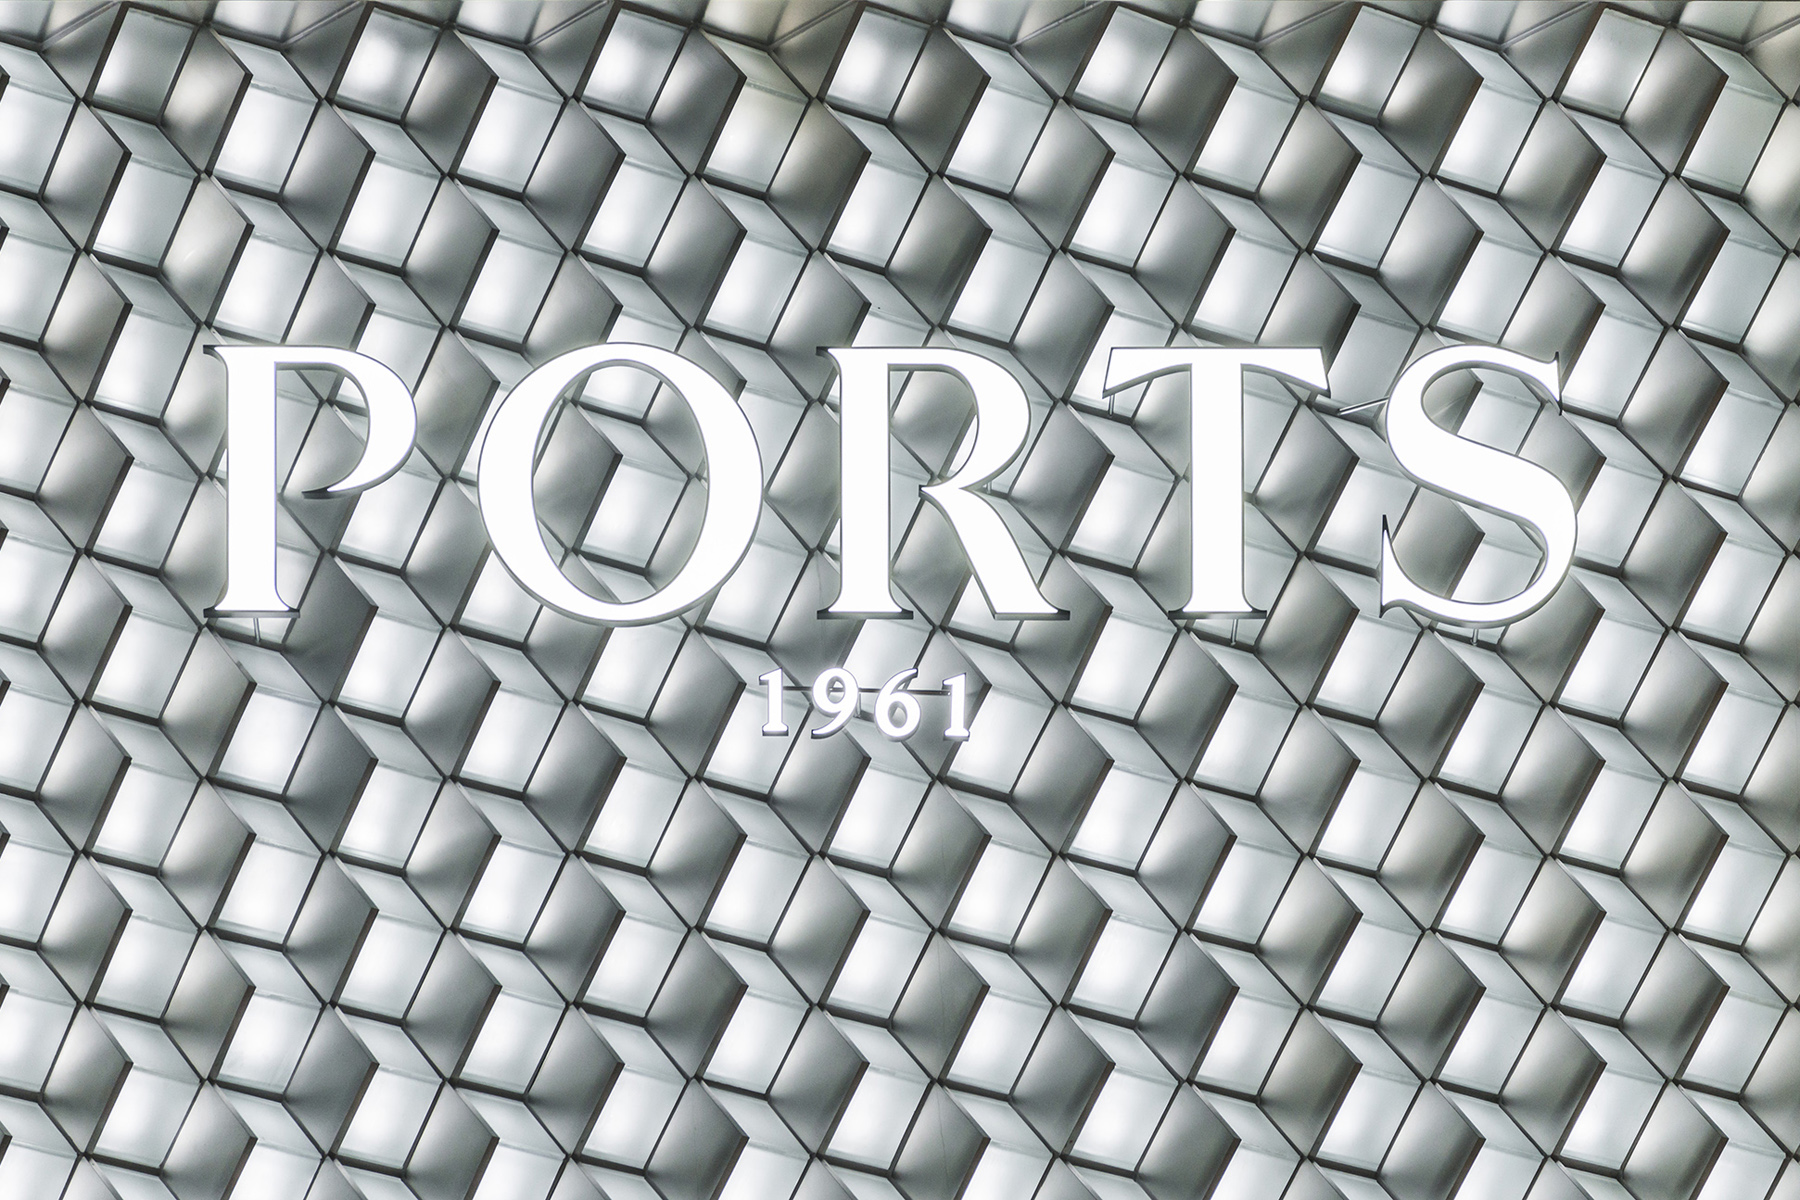 JEB_customprojects_facades_ports_HK_retail_6.jpg